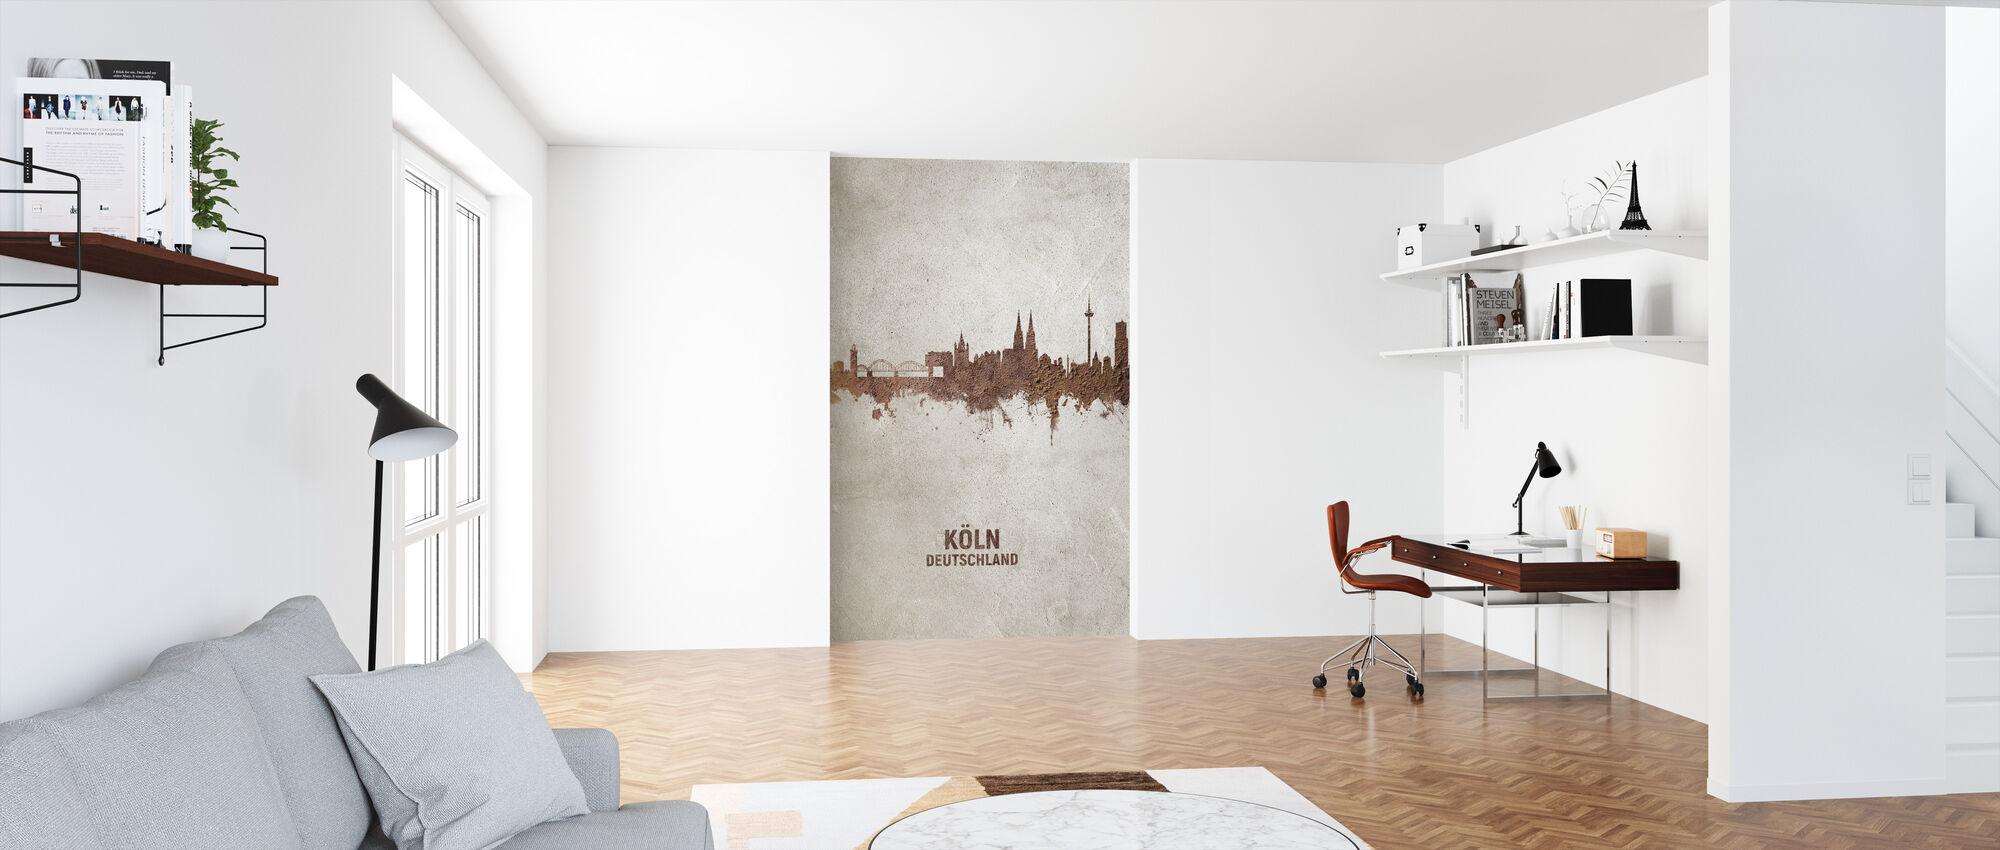 Köln Tyskland Rust Skyline - Tapet - Kontor